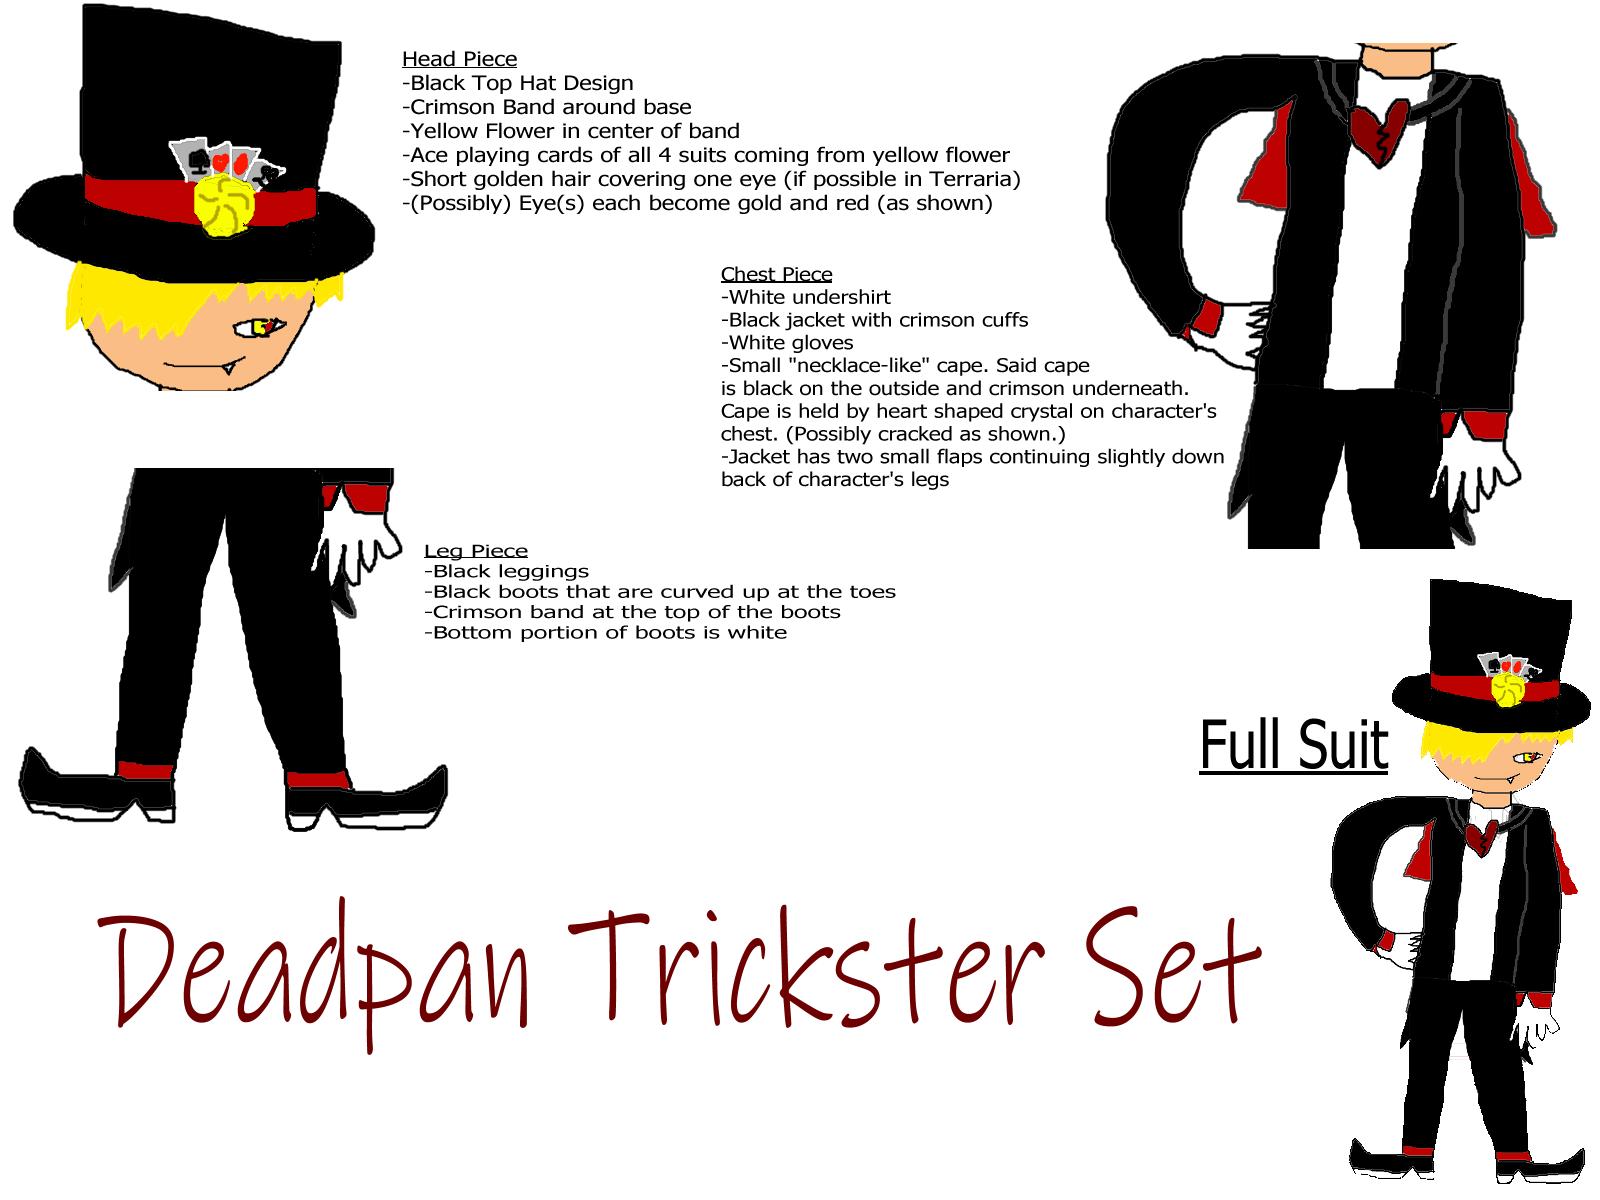 Deadpan Trickster Set (Concept Pic).png